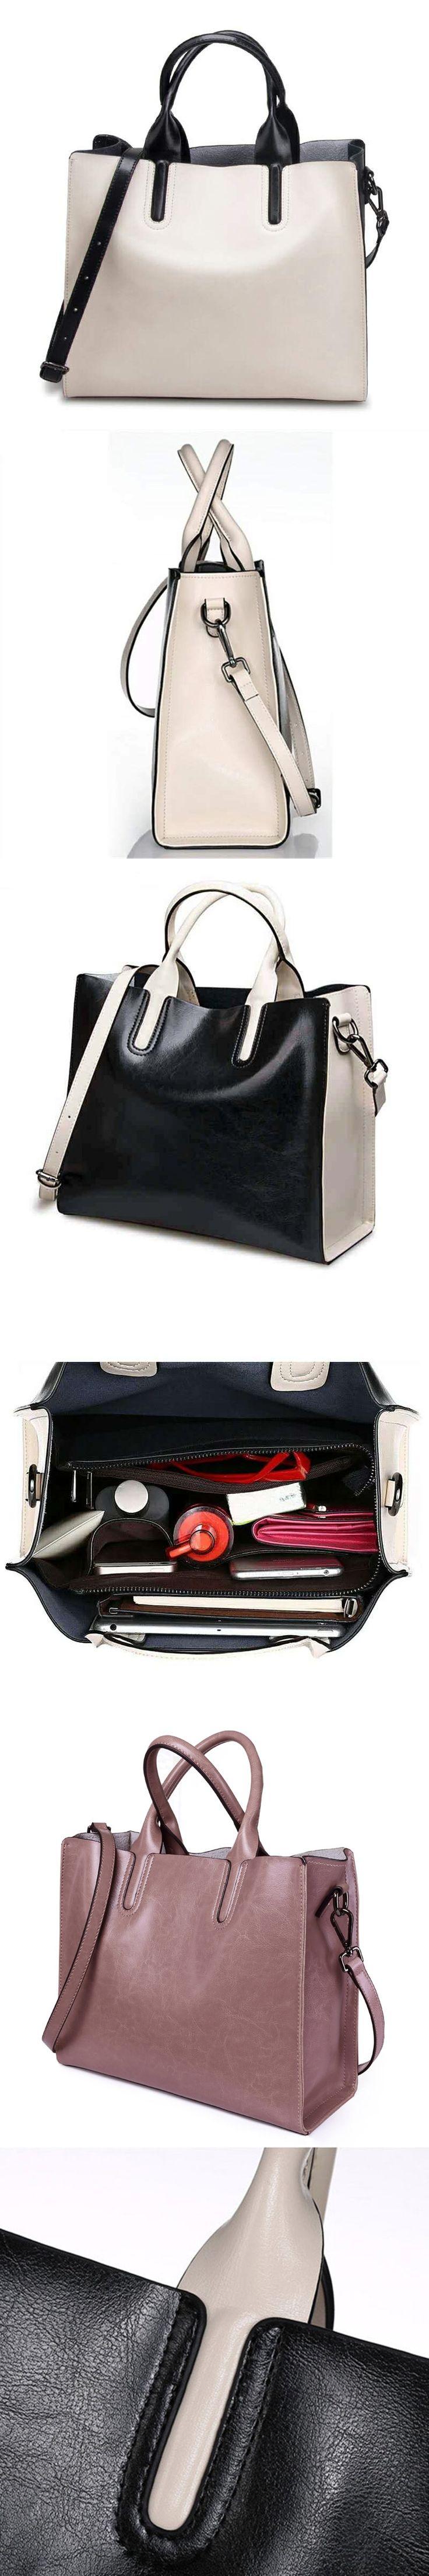 Hot selling luxury leather women's handbag Brand design shoulder bag women messenger bag Russian Fashion style bags for ladies